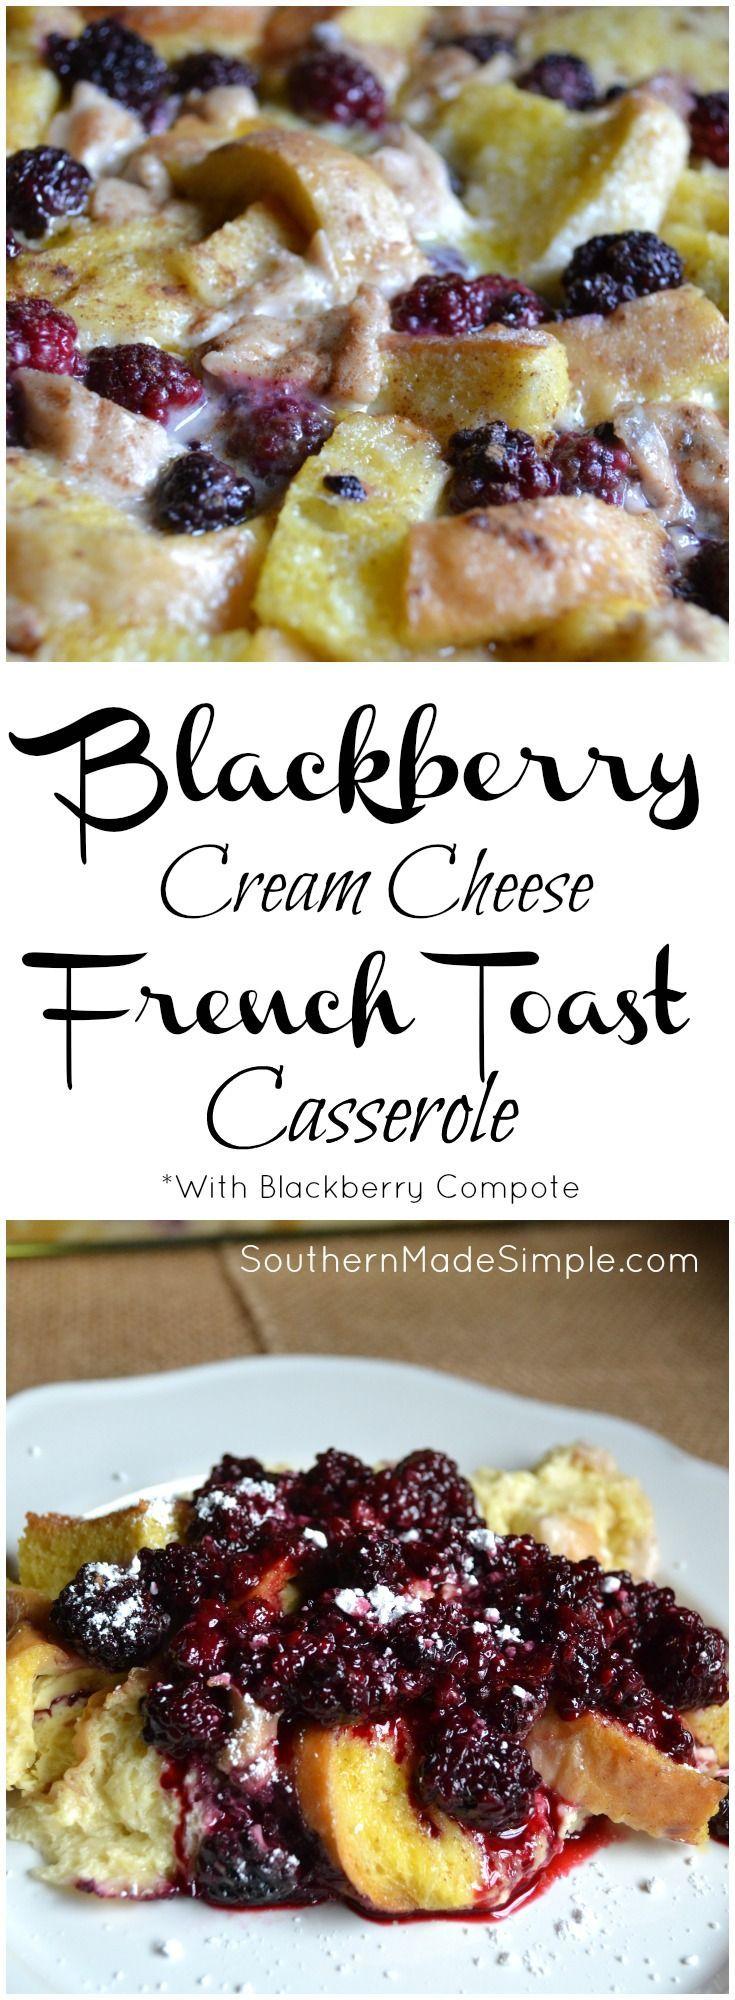 Blackberry Cream Cheese French Toast Casserole